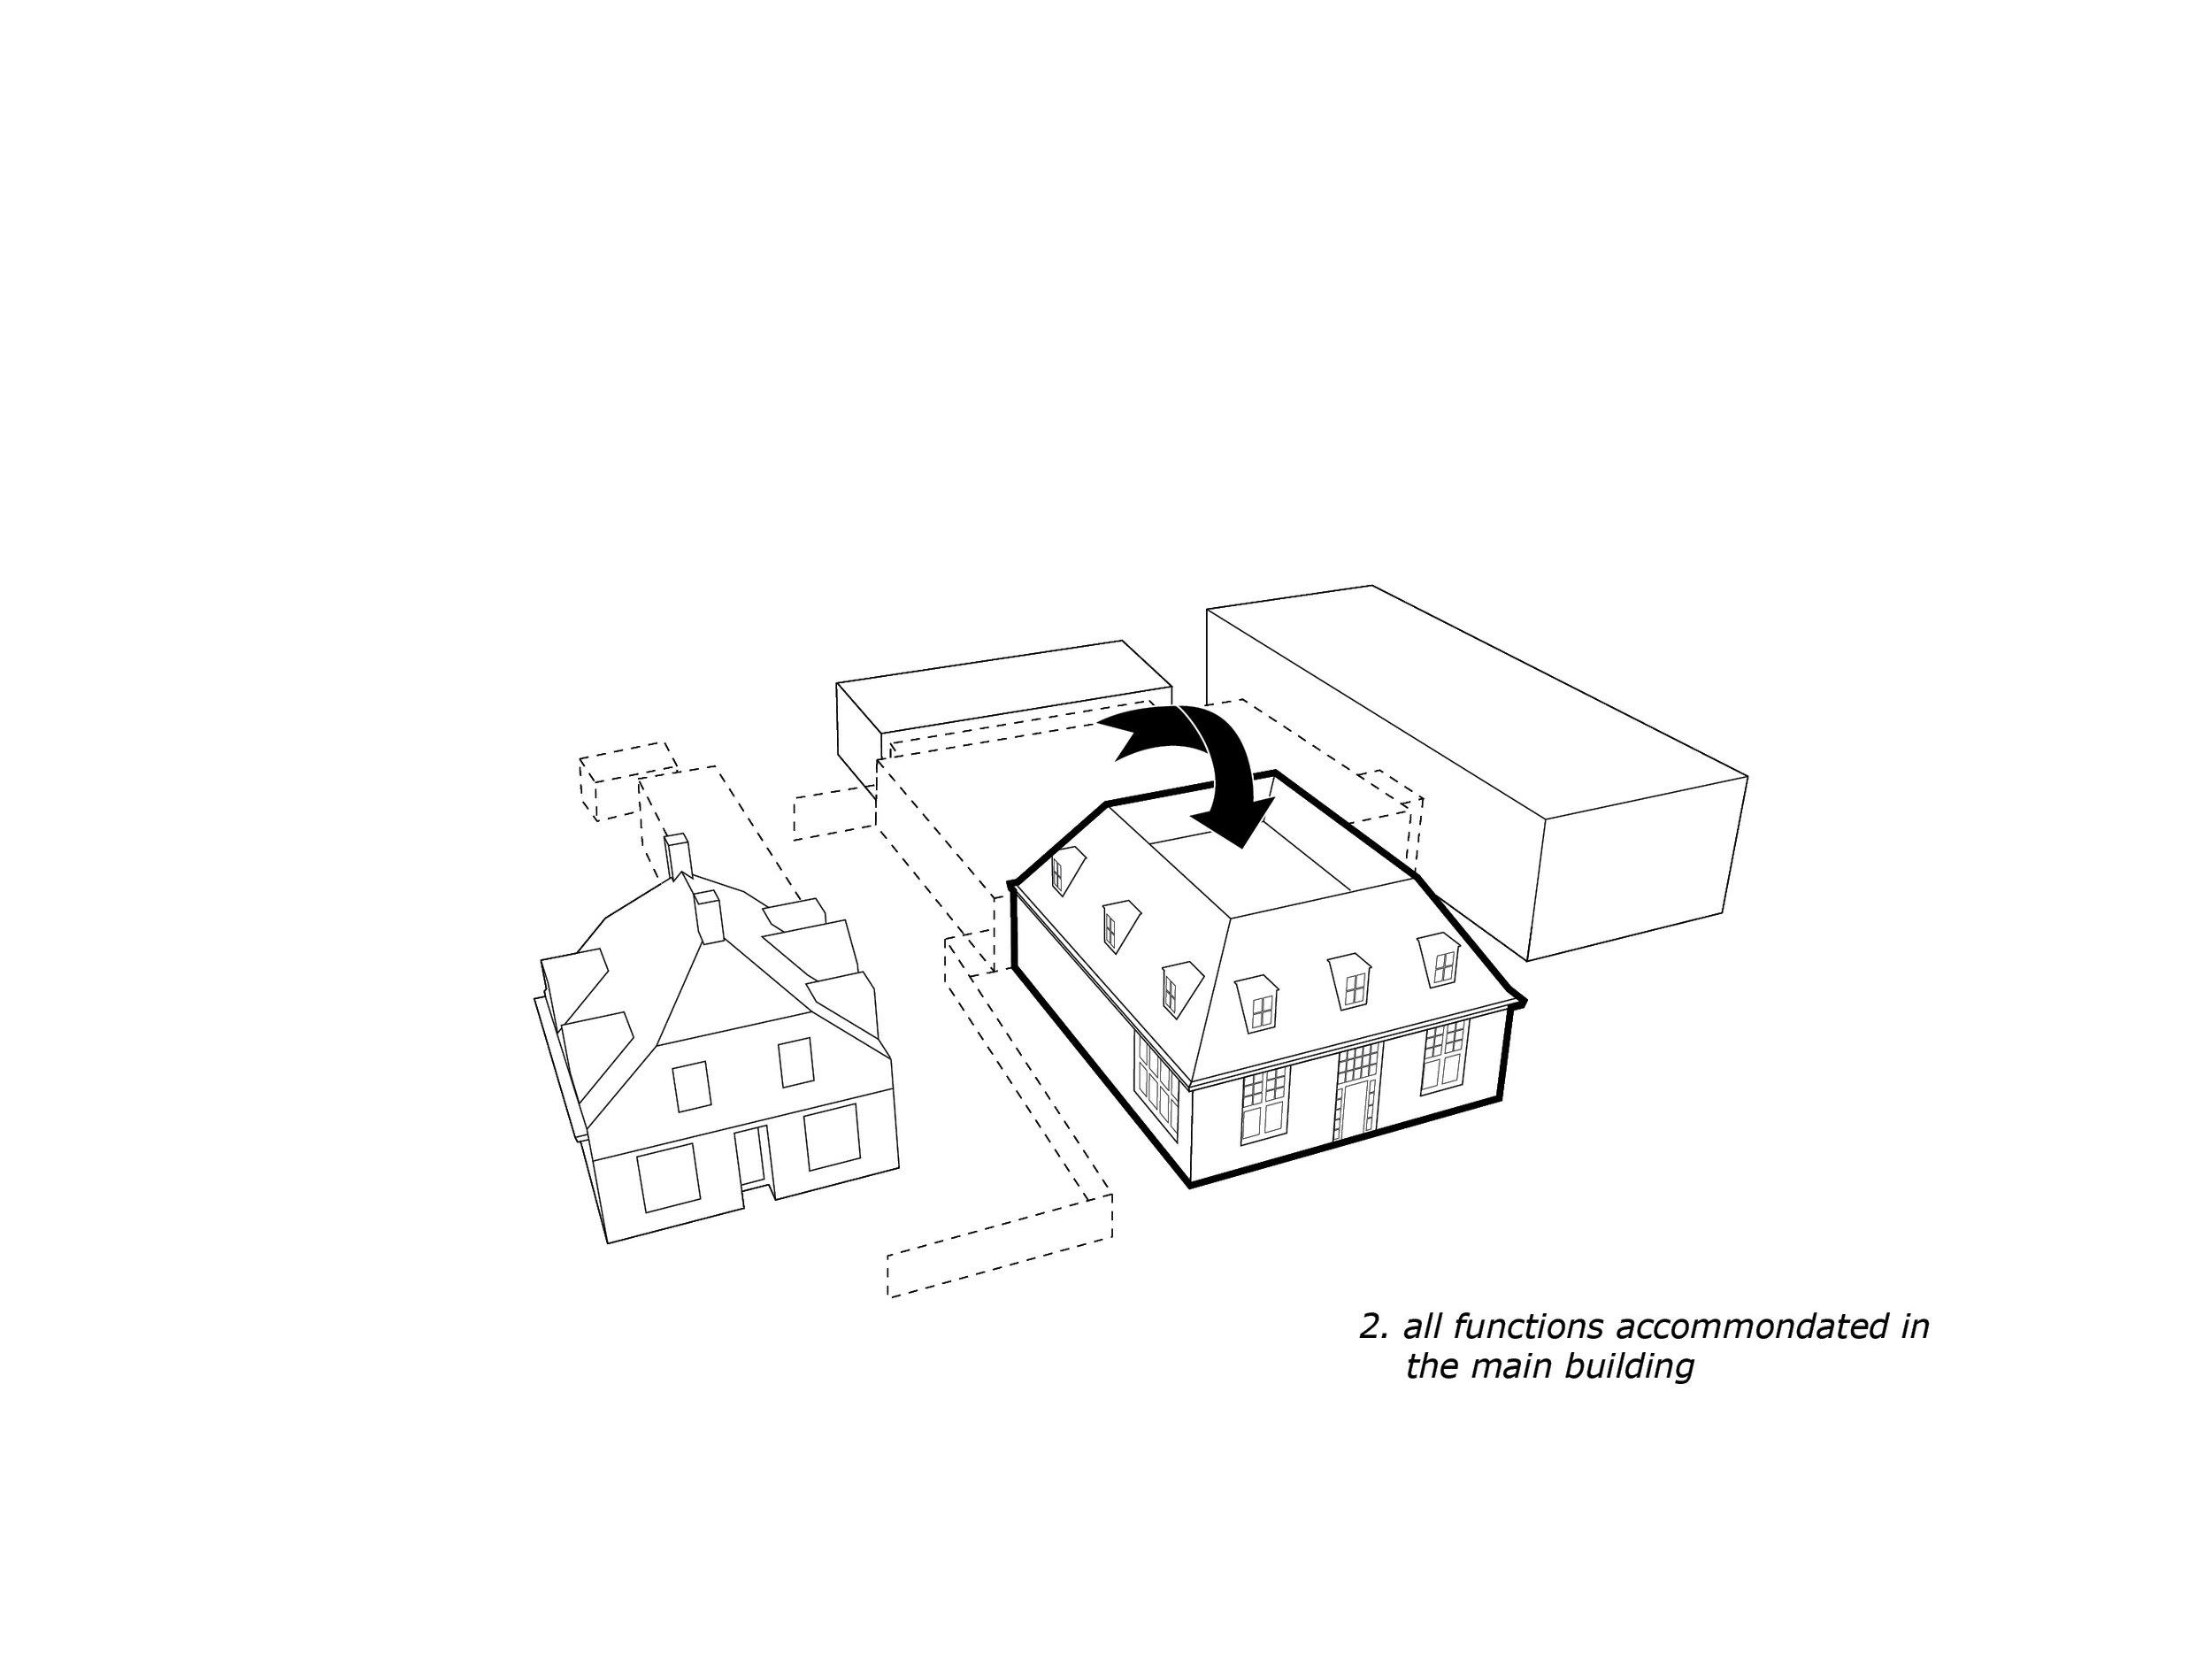 Personal-Architecture-soest-stayokay2-2.jpg